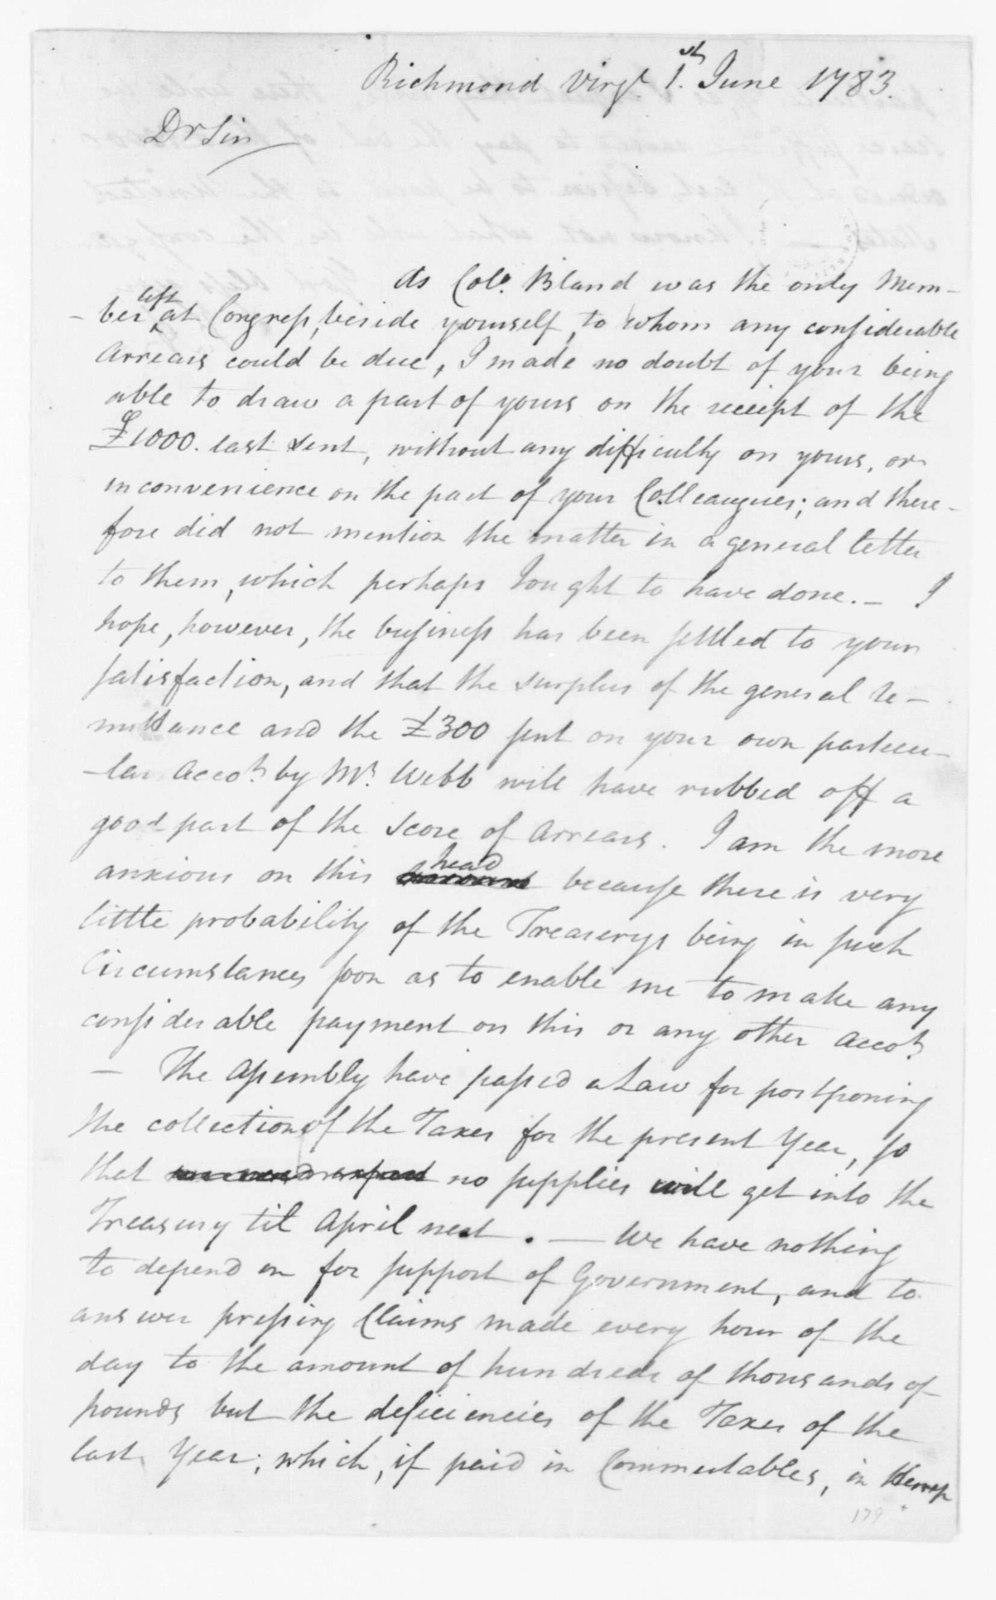 Jacquelin Ambler to James Madison, June 1, 1783.